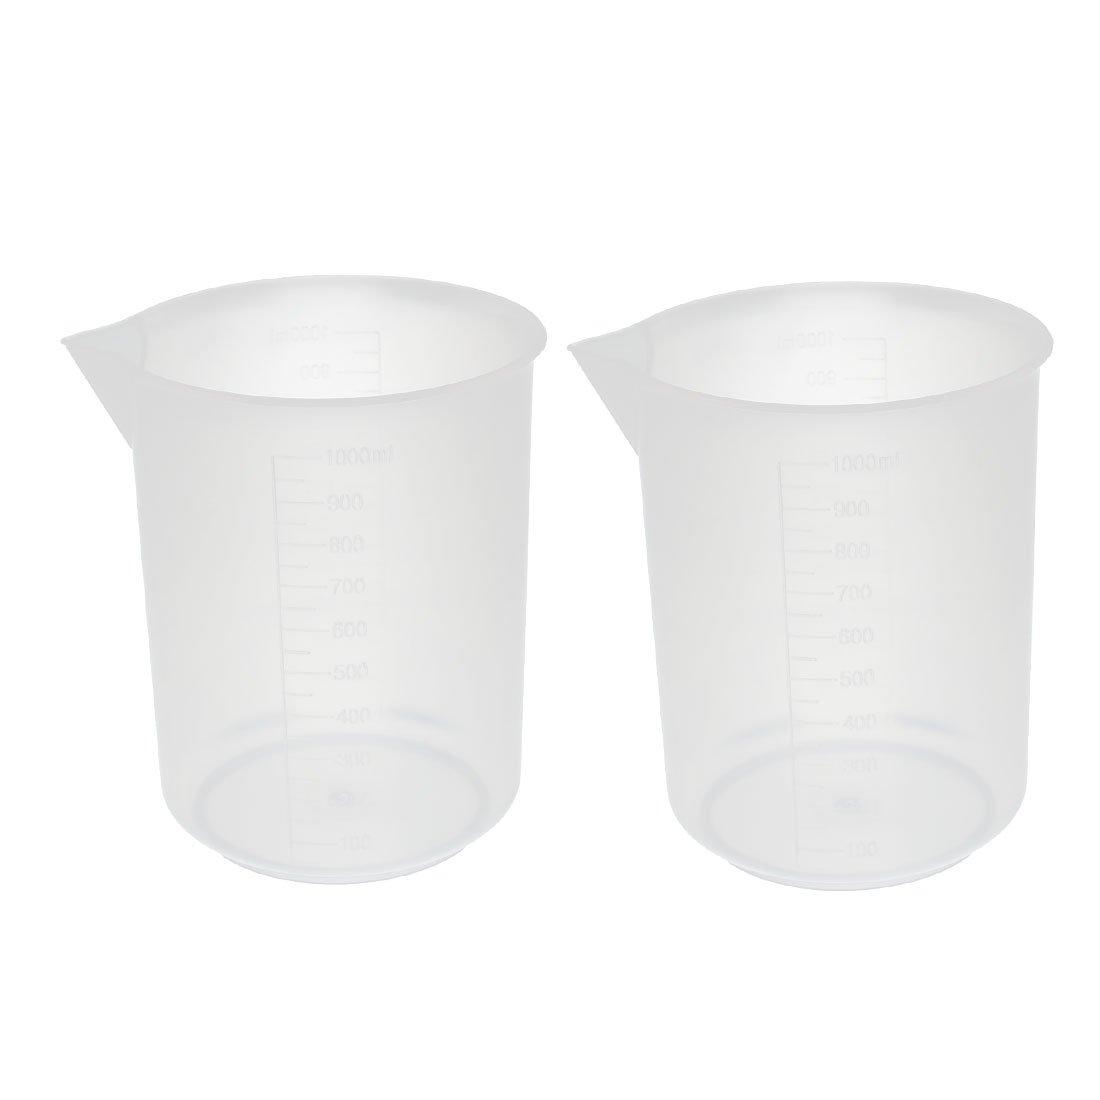 uxcell 2Pcs Lowest price Boston Mall challenge Kitchen Labotary 1000mL Po Cup Plastic Jug Measuring